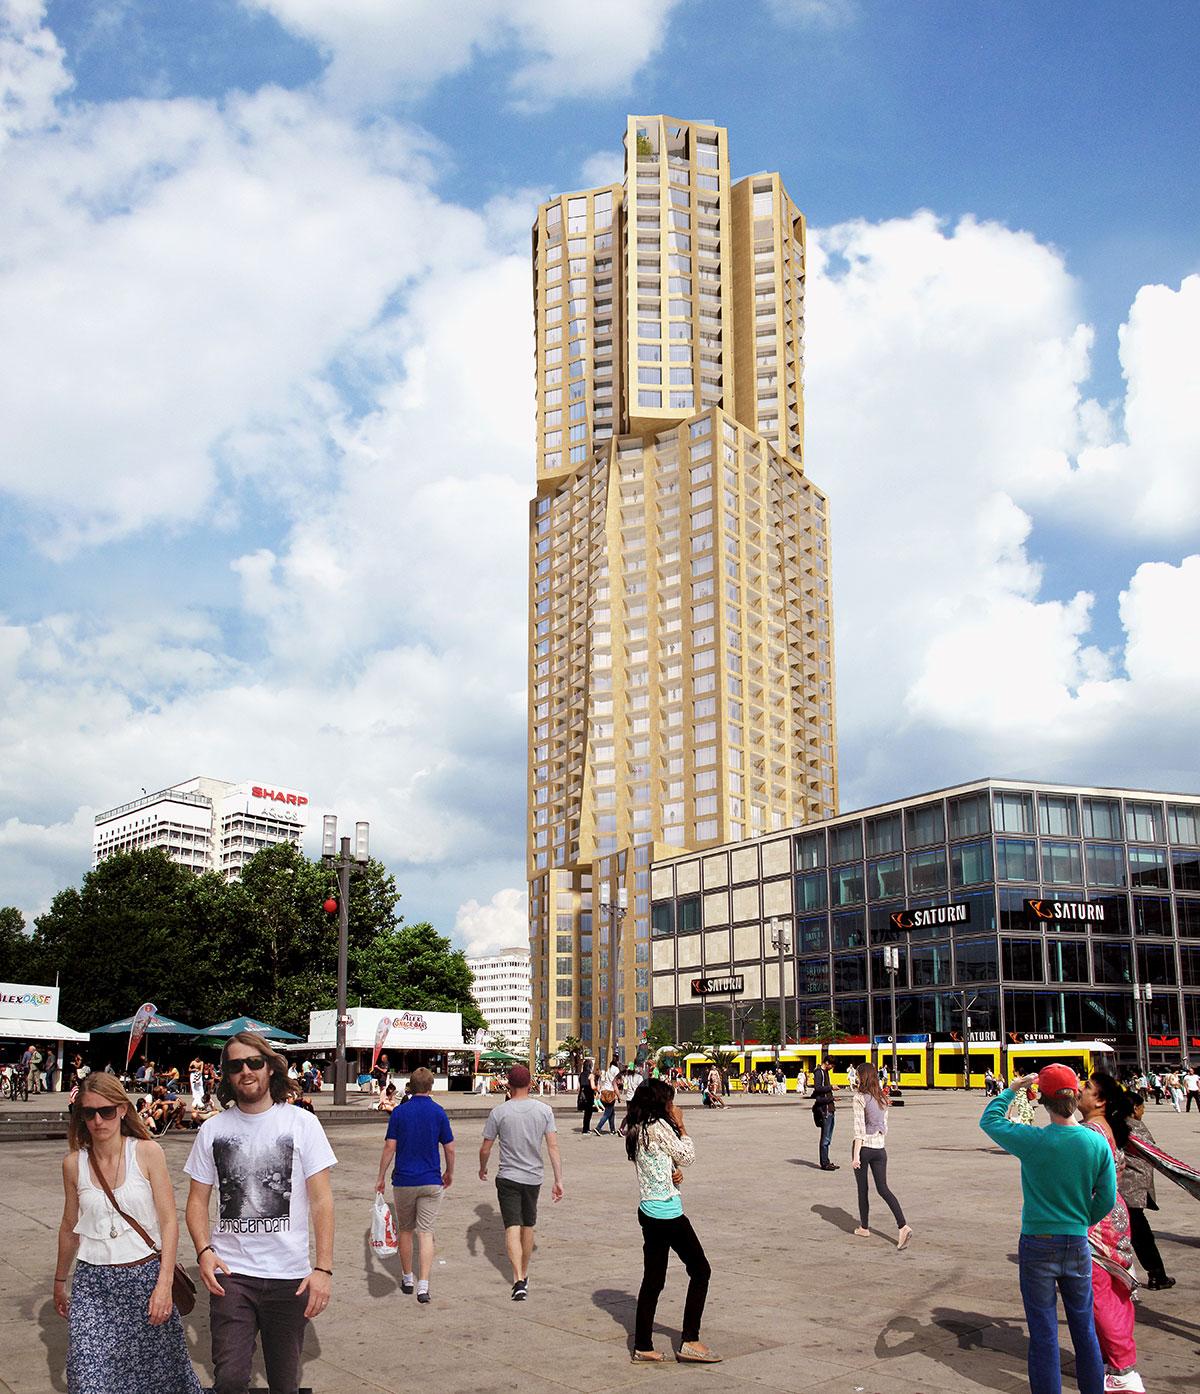 Alexanderplatz Residential